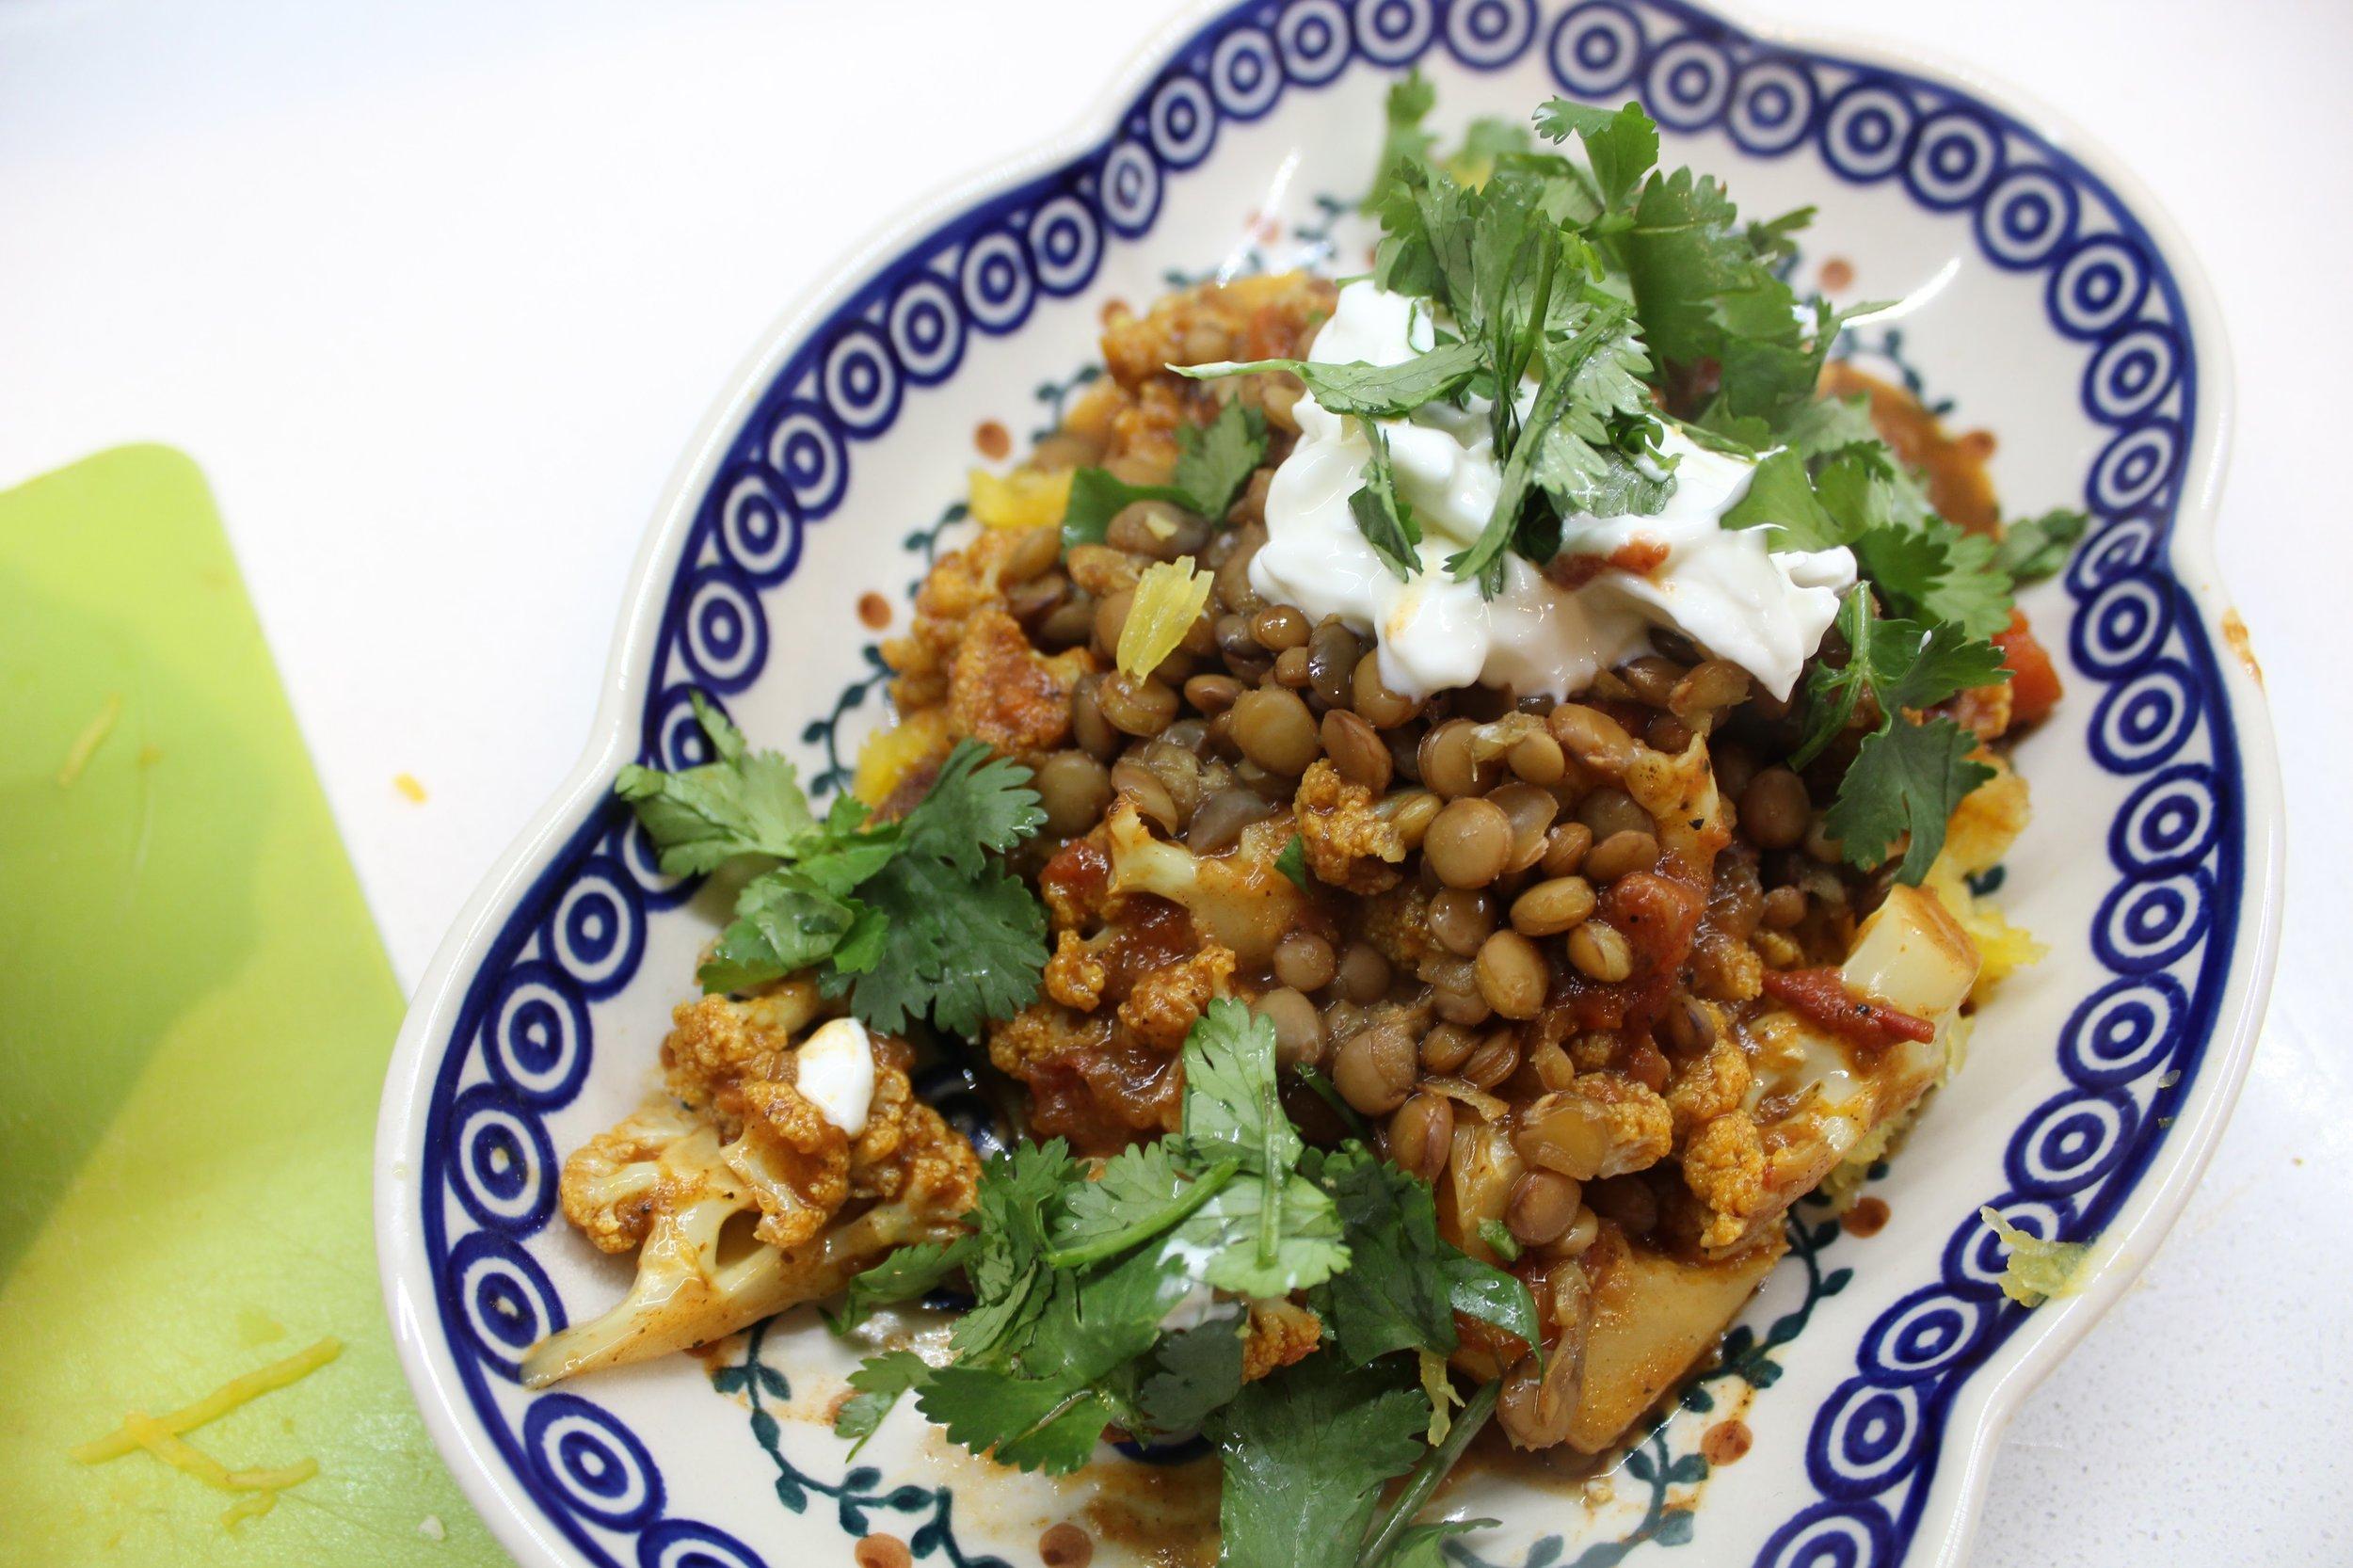 Quick & Spicy Cauliflower Korma (GF, Vegetarian, Vegan) found on www.natashawellness.com